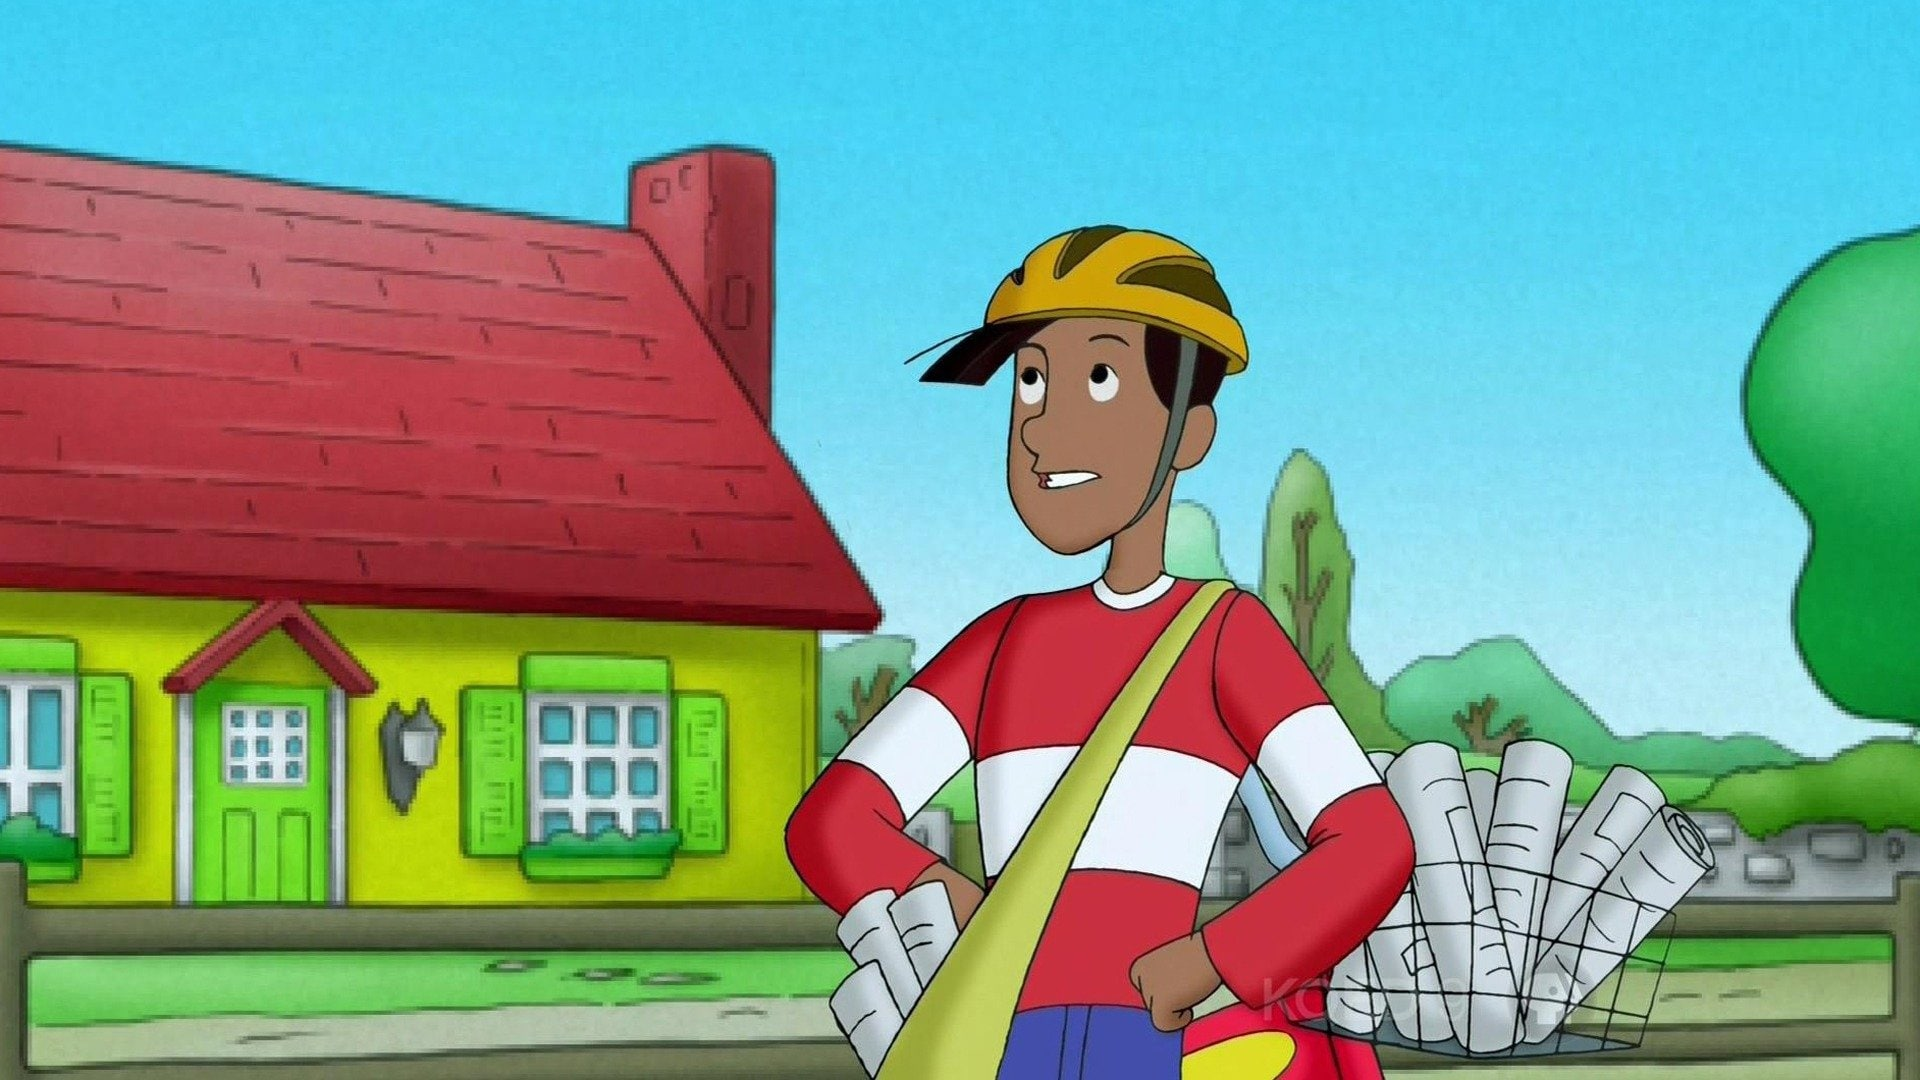 Downhill Racer; Book Monkey